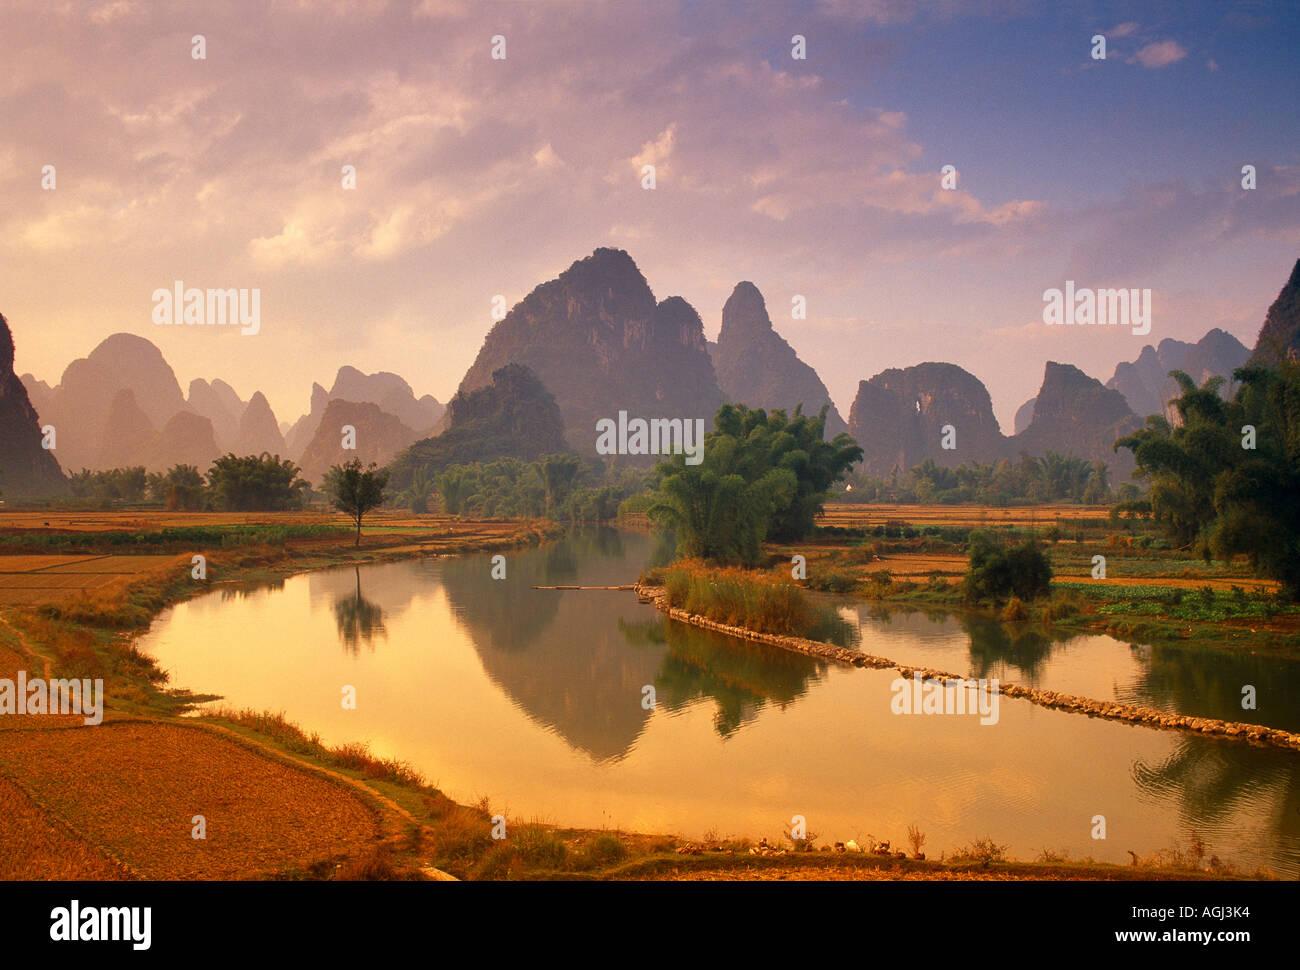 River Li nr Yangshou Guangxi Province China - Stock Image